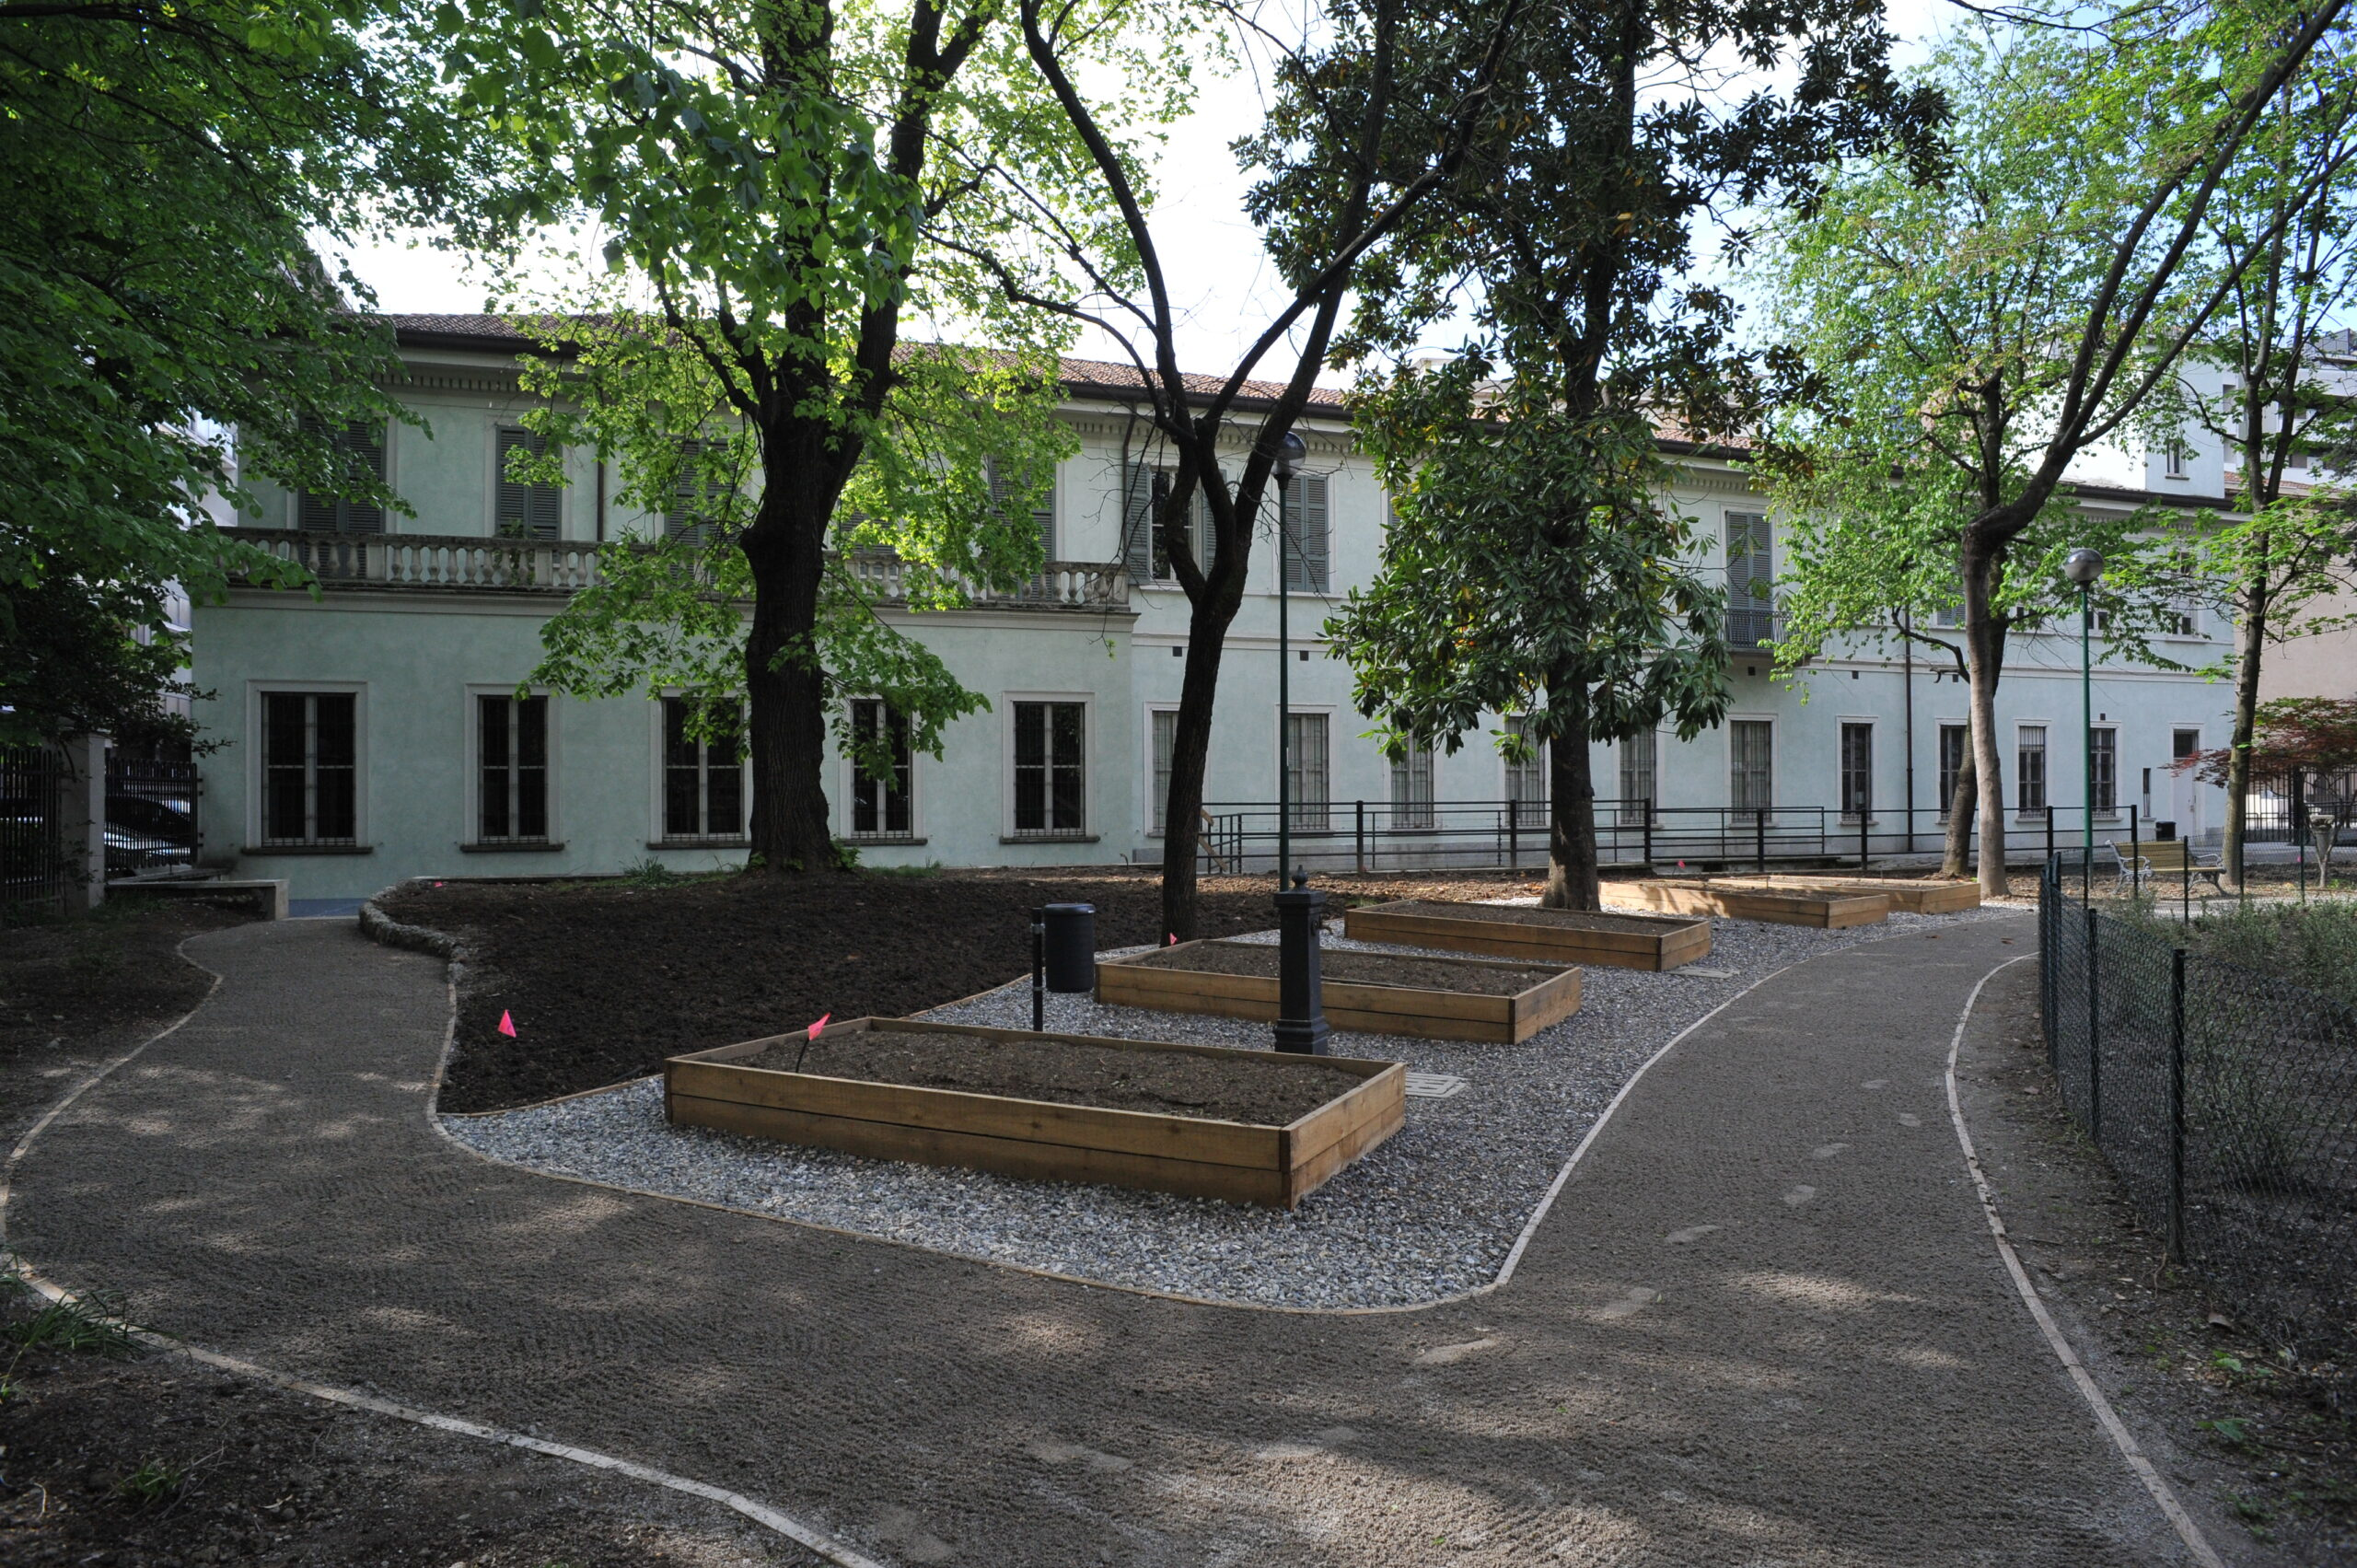 Giardino botanico di villa Mylius